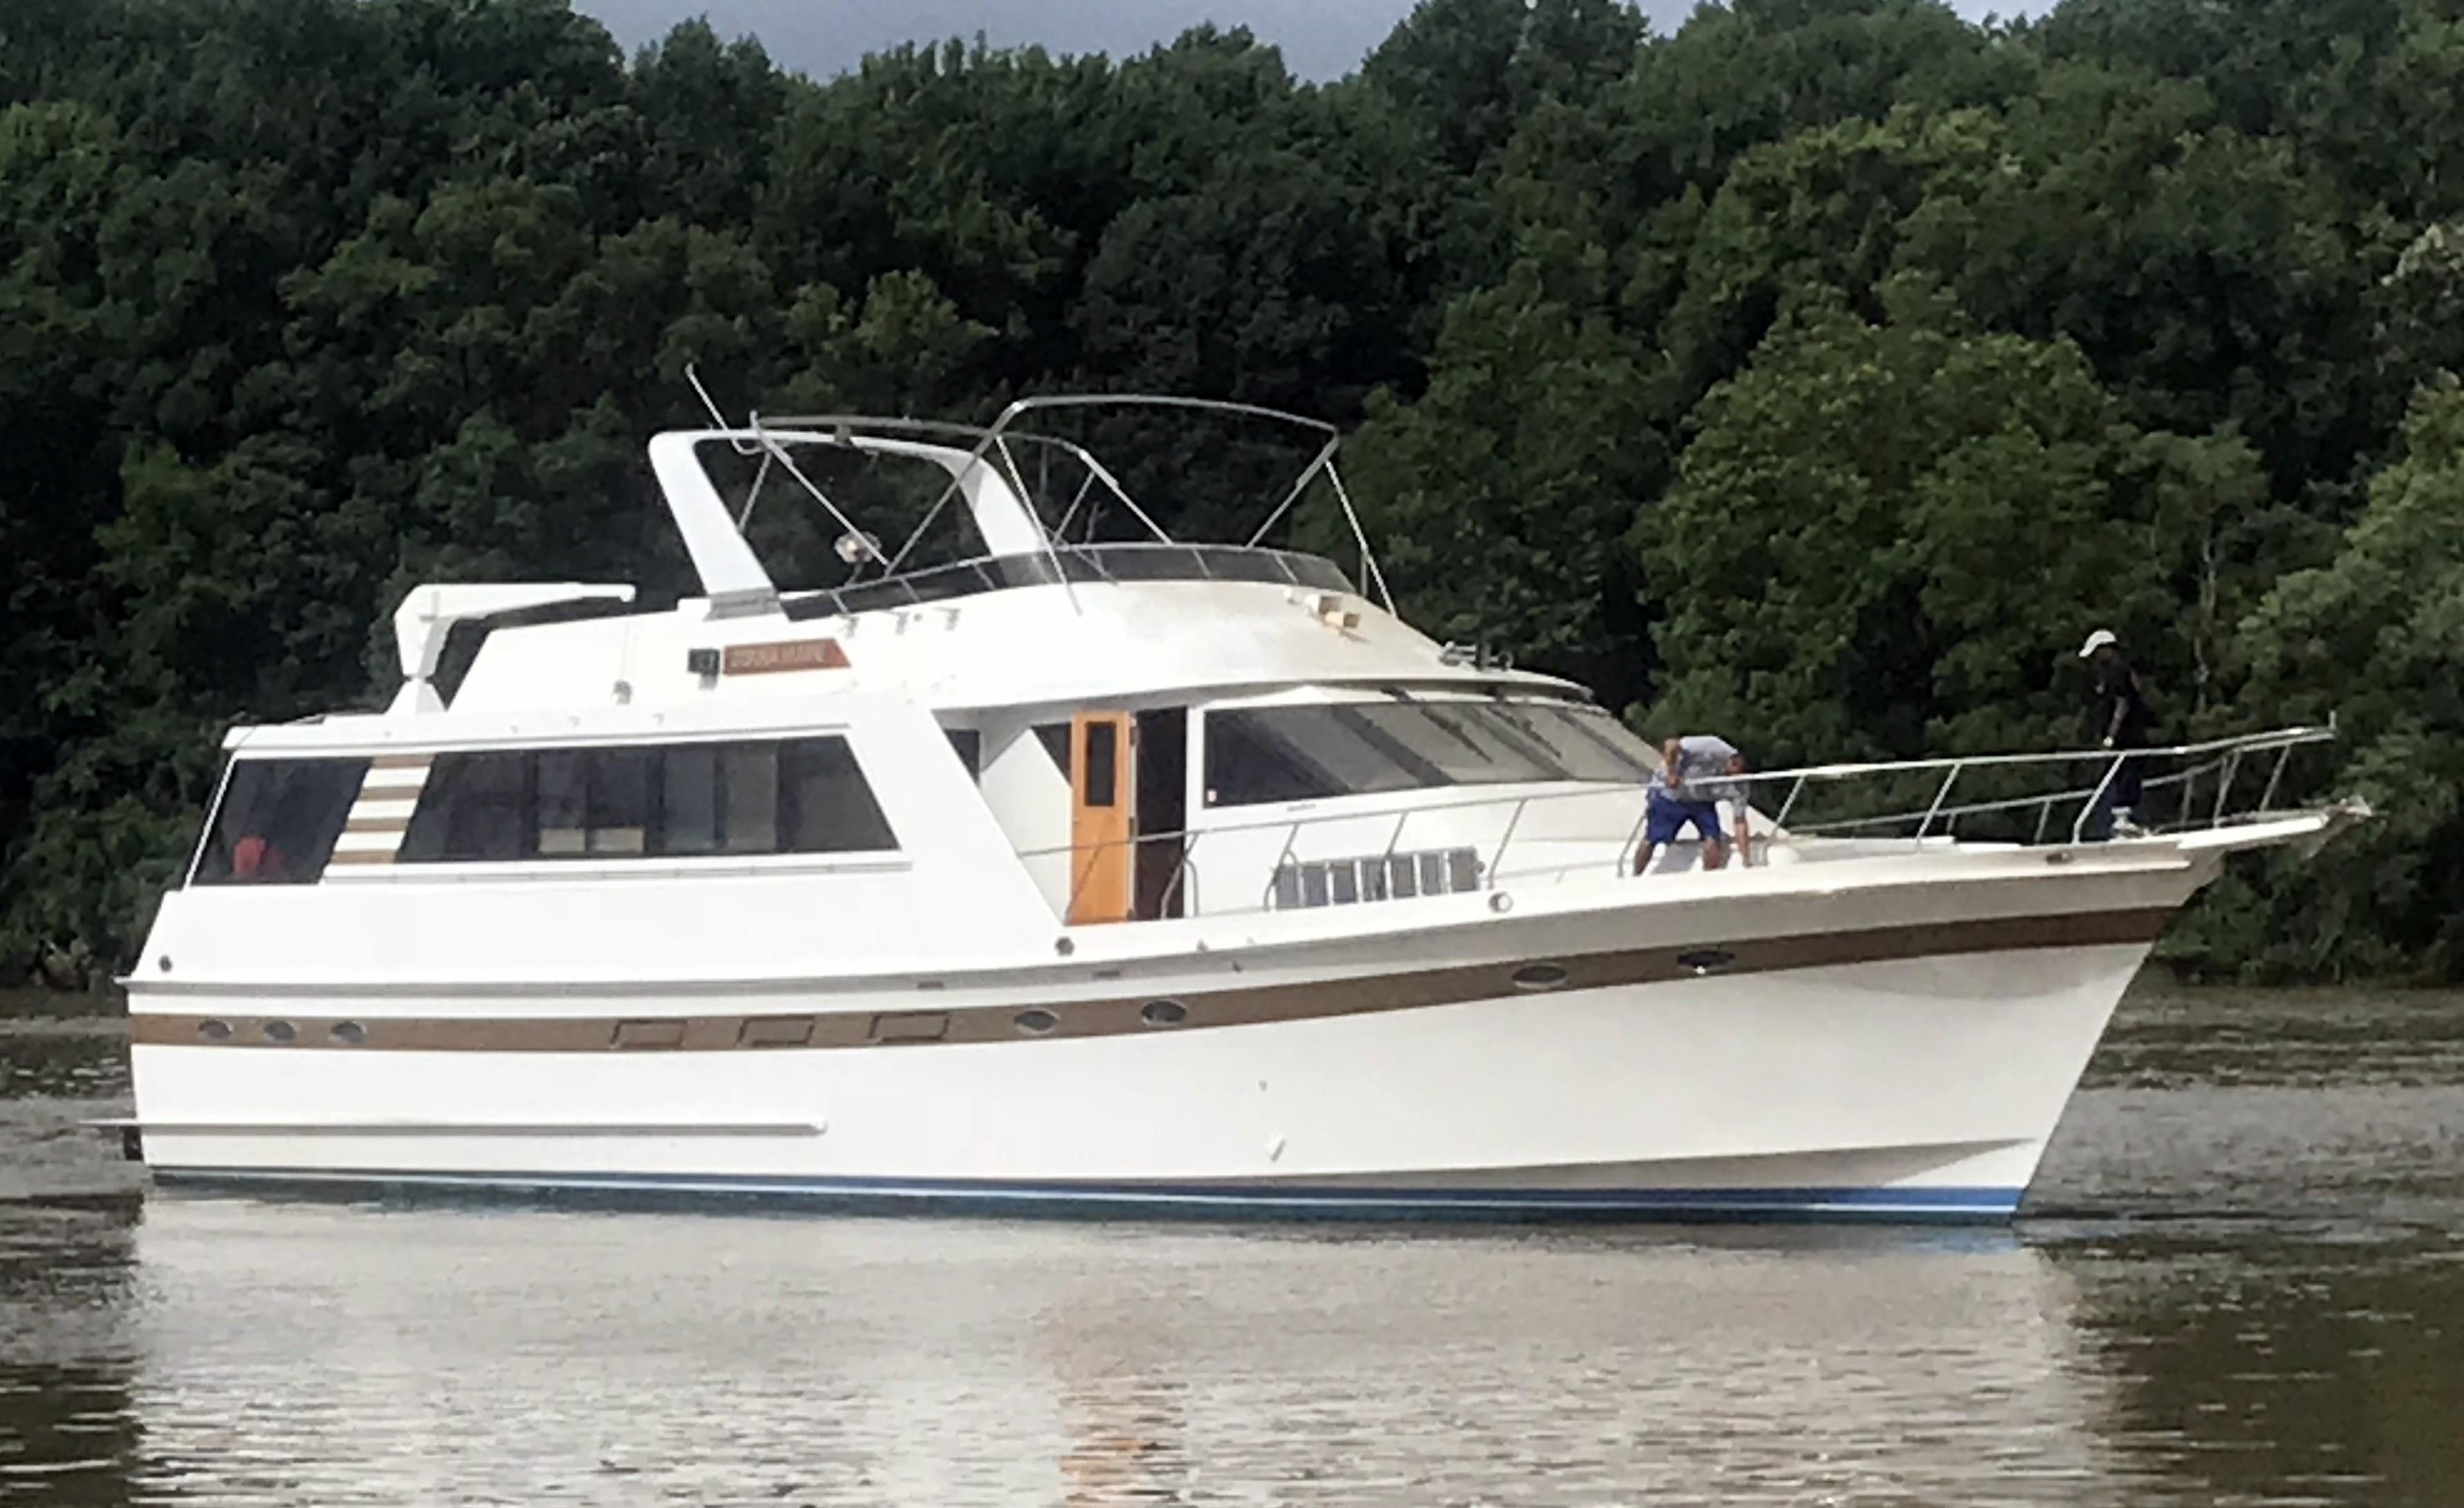 Cheap Full Coverage Insurance >> 1988 Ocean Alexander Motoryacht Power Boat For Sale - www ...